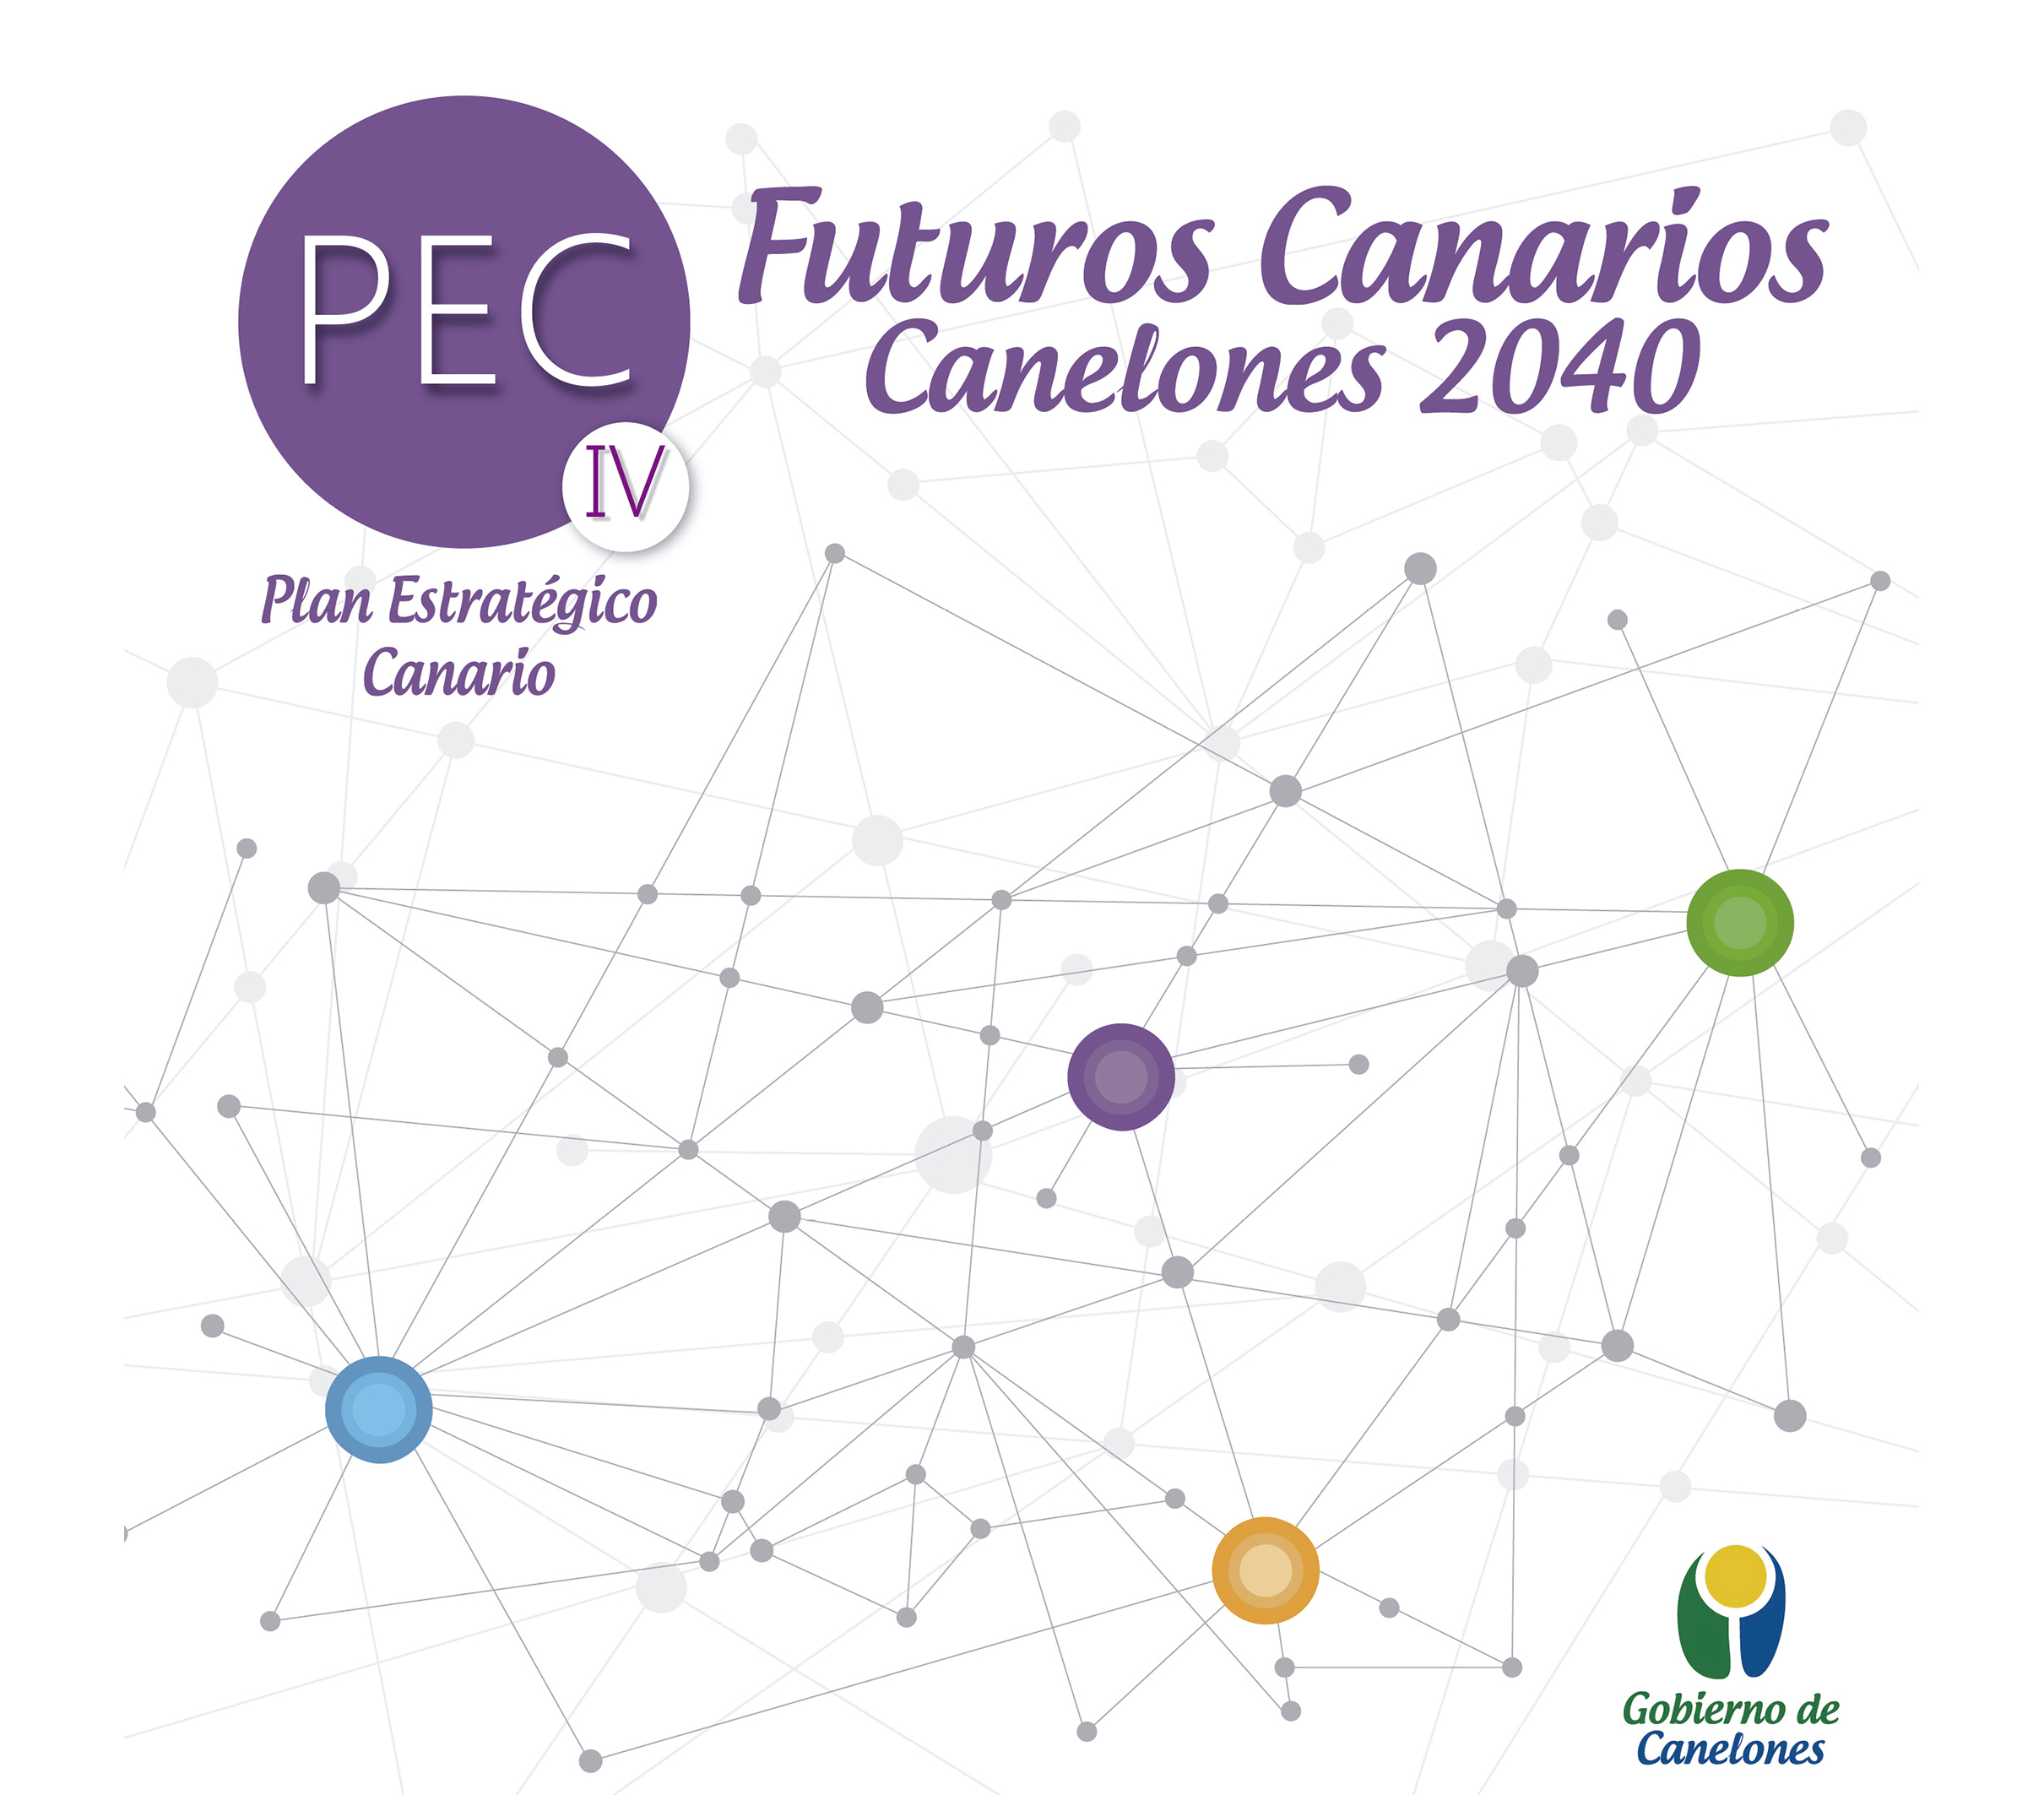 Plan Estratégico Canario IV Futuros Canarios, Canelones 2040